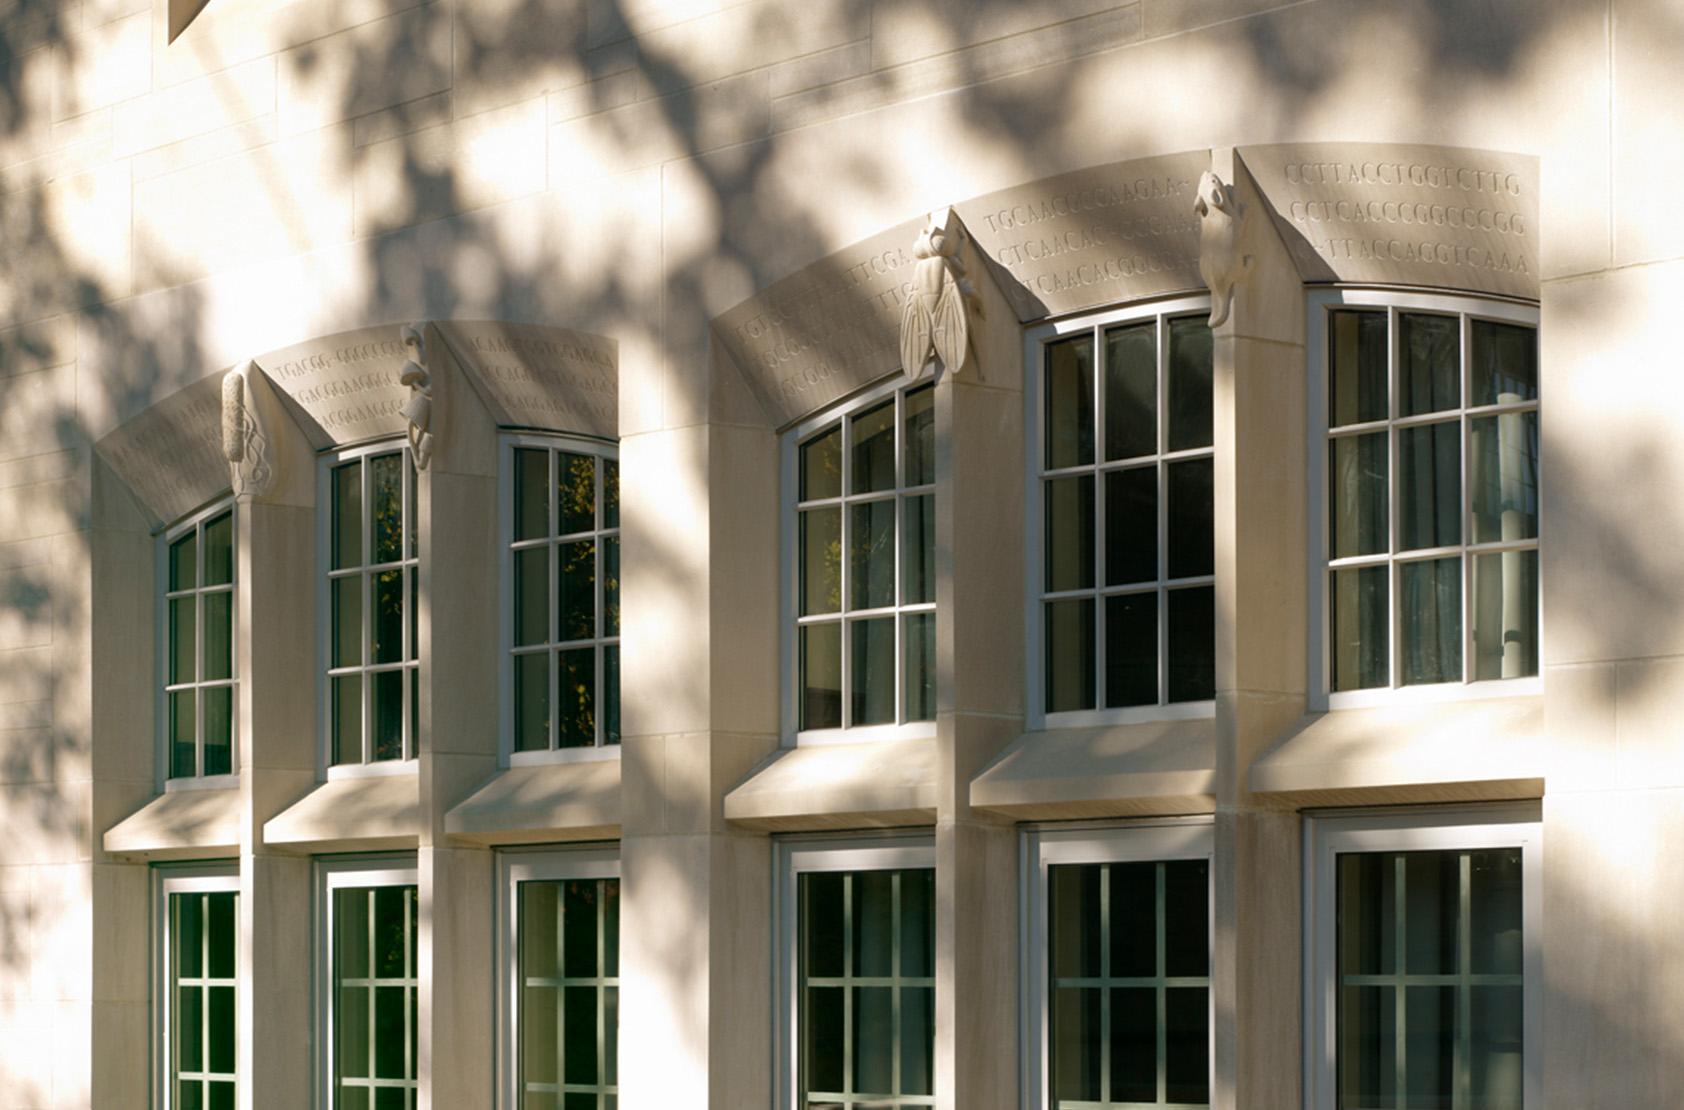 Indiana University - Simon Hall